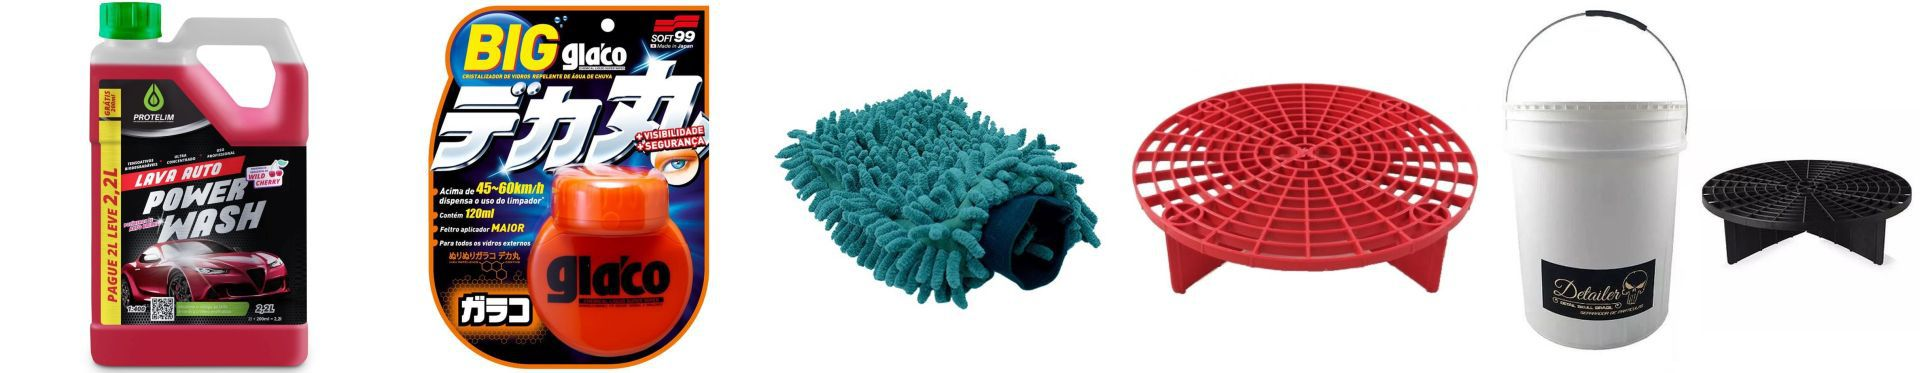 Kit Power Wash 1-400 - 2,2 Litros+Glaco Roll on Large 120ml+Luva De Microfibra+Separador de Particulas+ Balde Com Separador